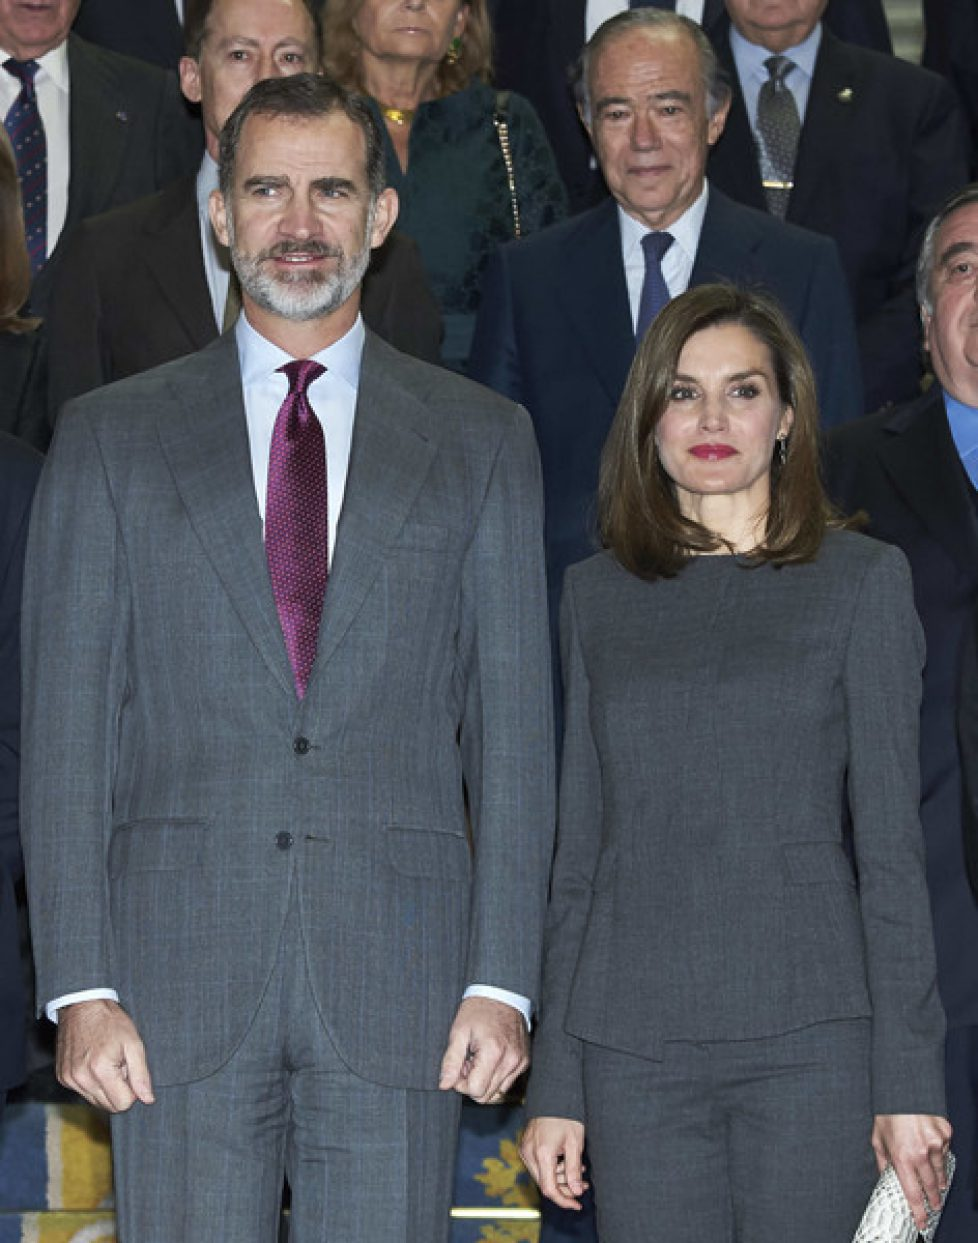 Spanish+Royals+Attend+Meeting+National+Library+biTZiheFIIZl